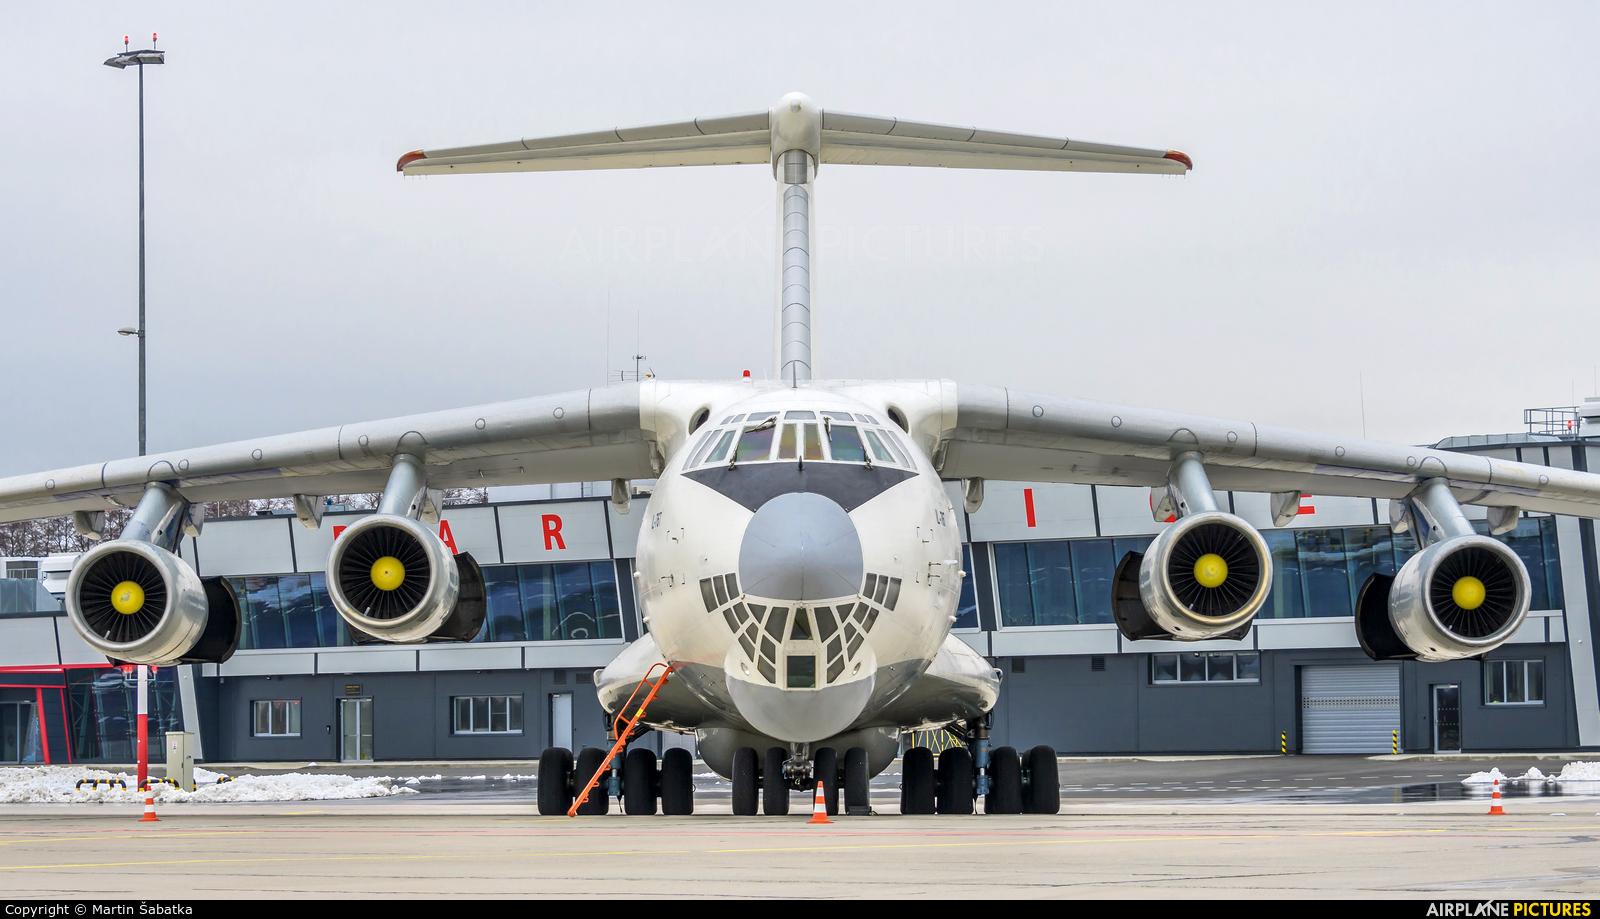 Yuzhmashavia UR-CPV aircraft at Pardubice